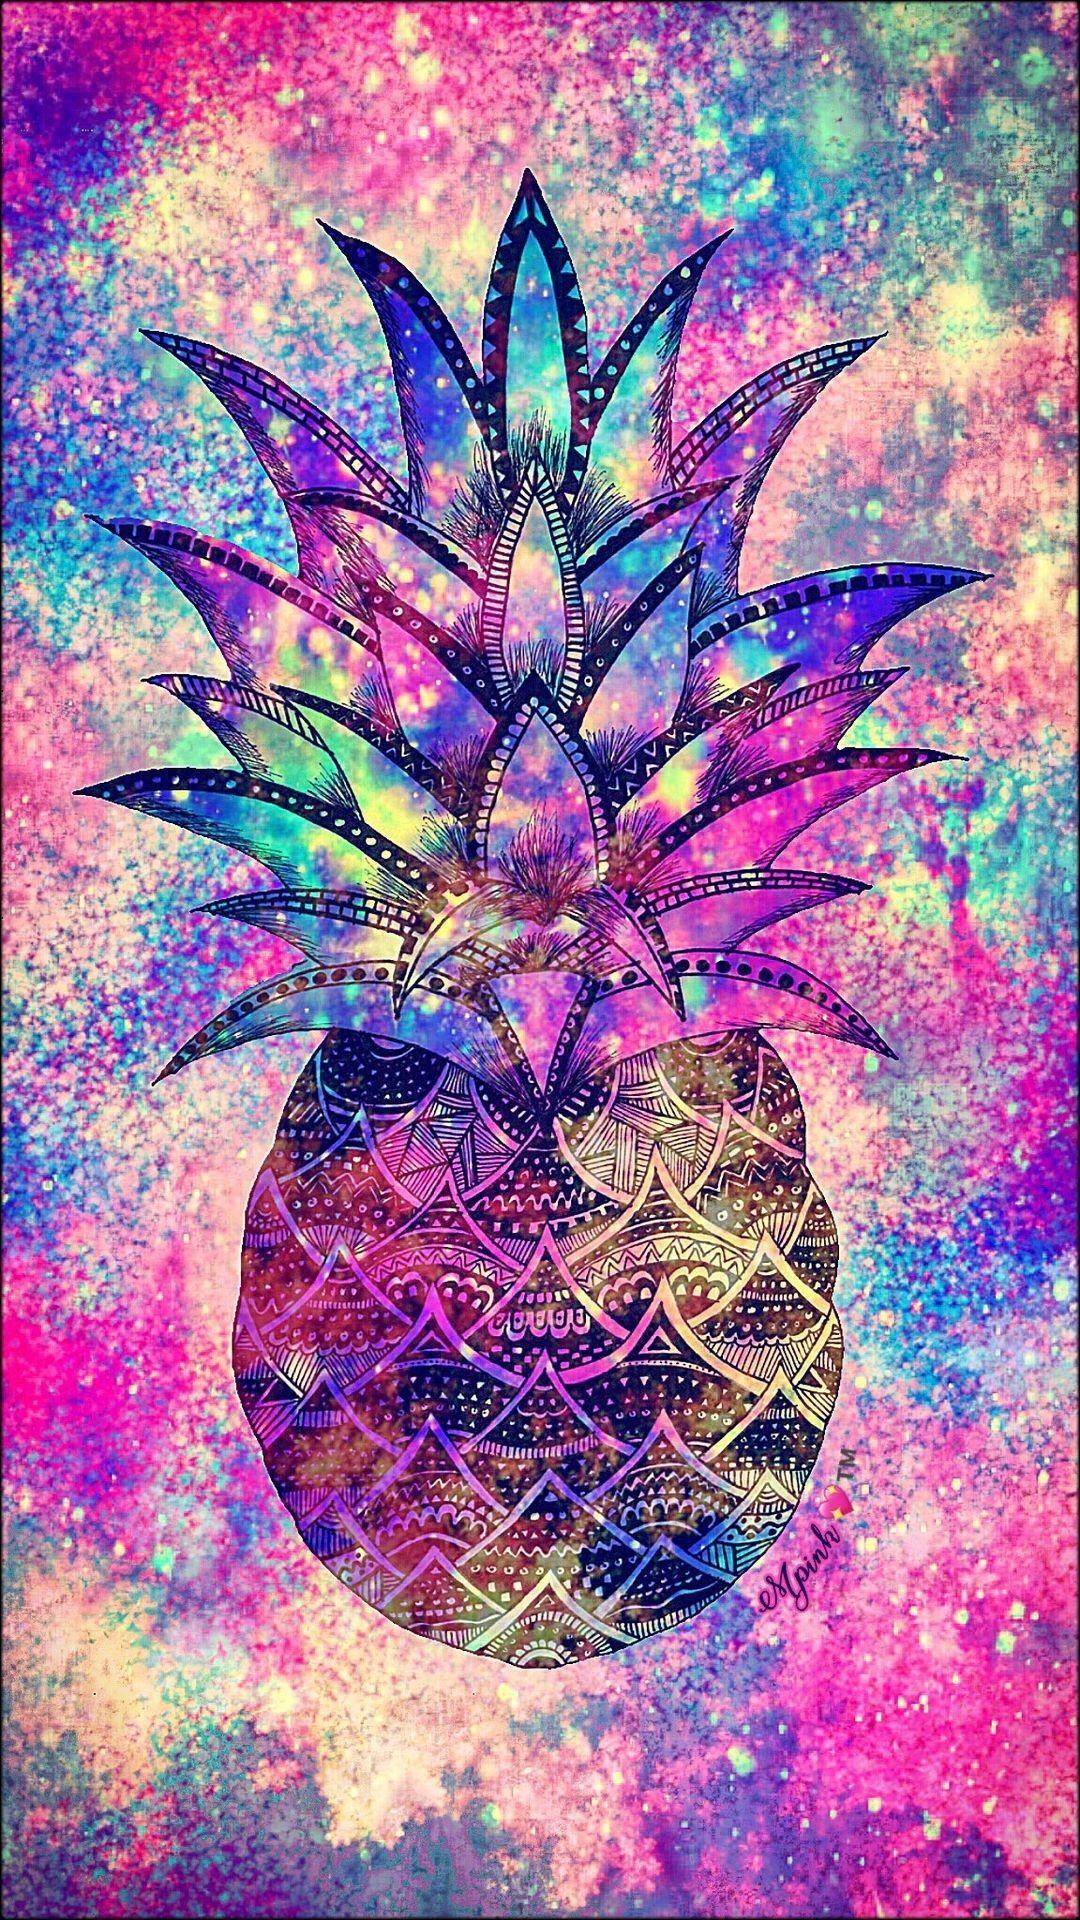 Purple Violet Psychedelic Art Graphic Design Art Fractal Art